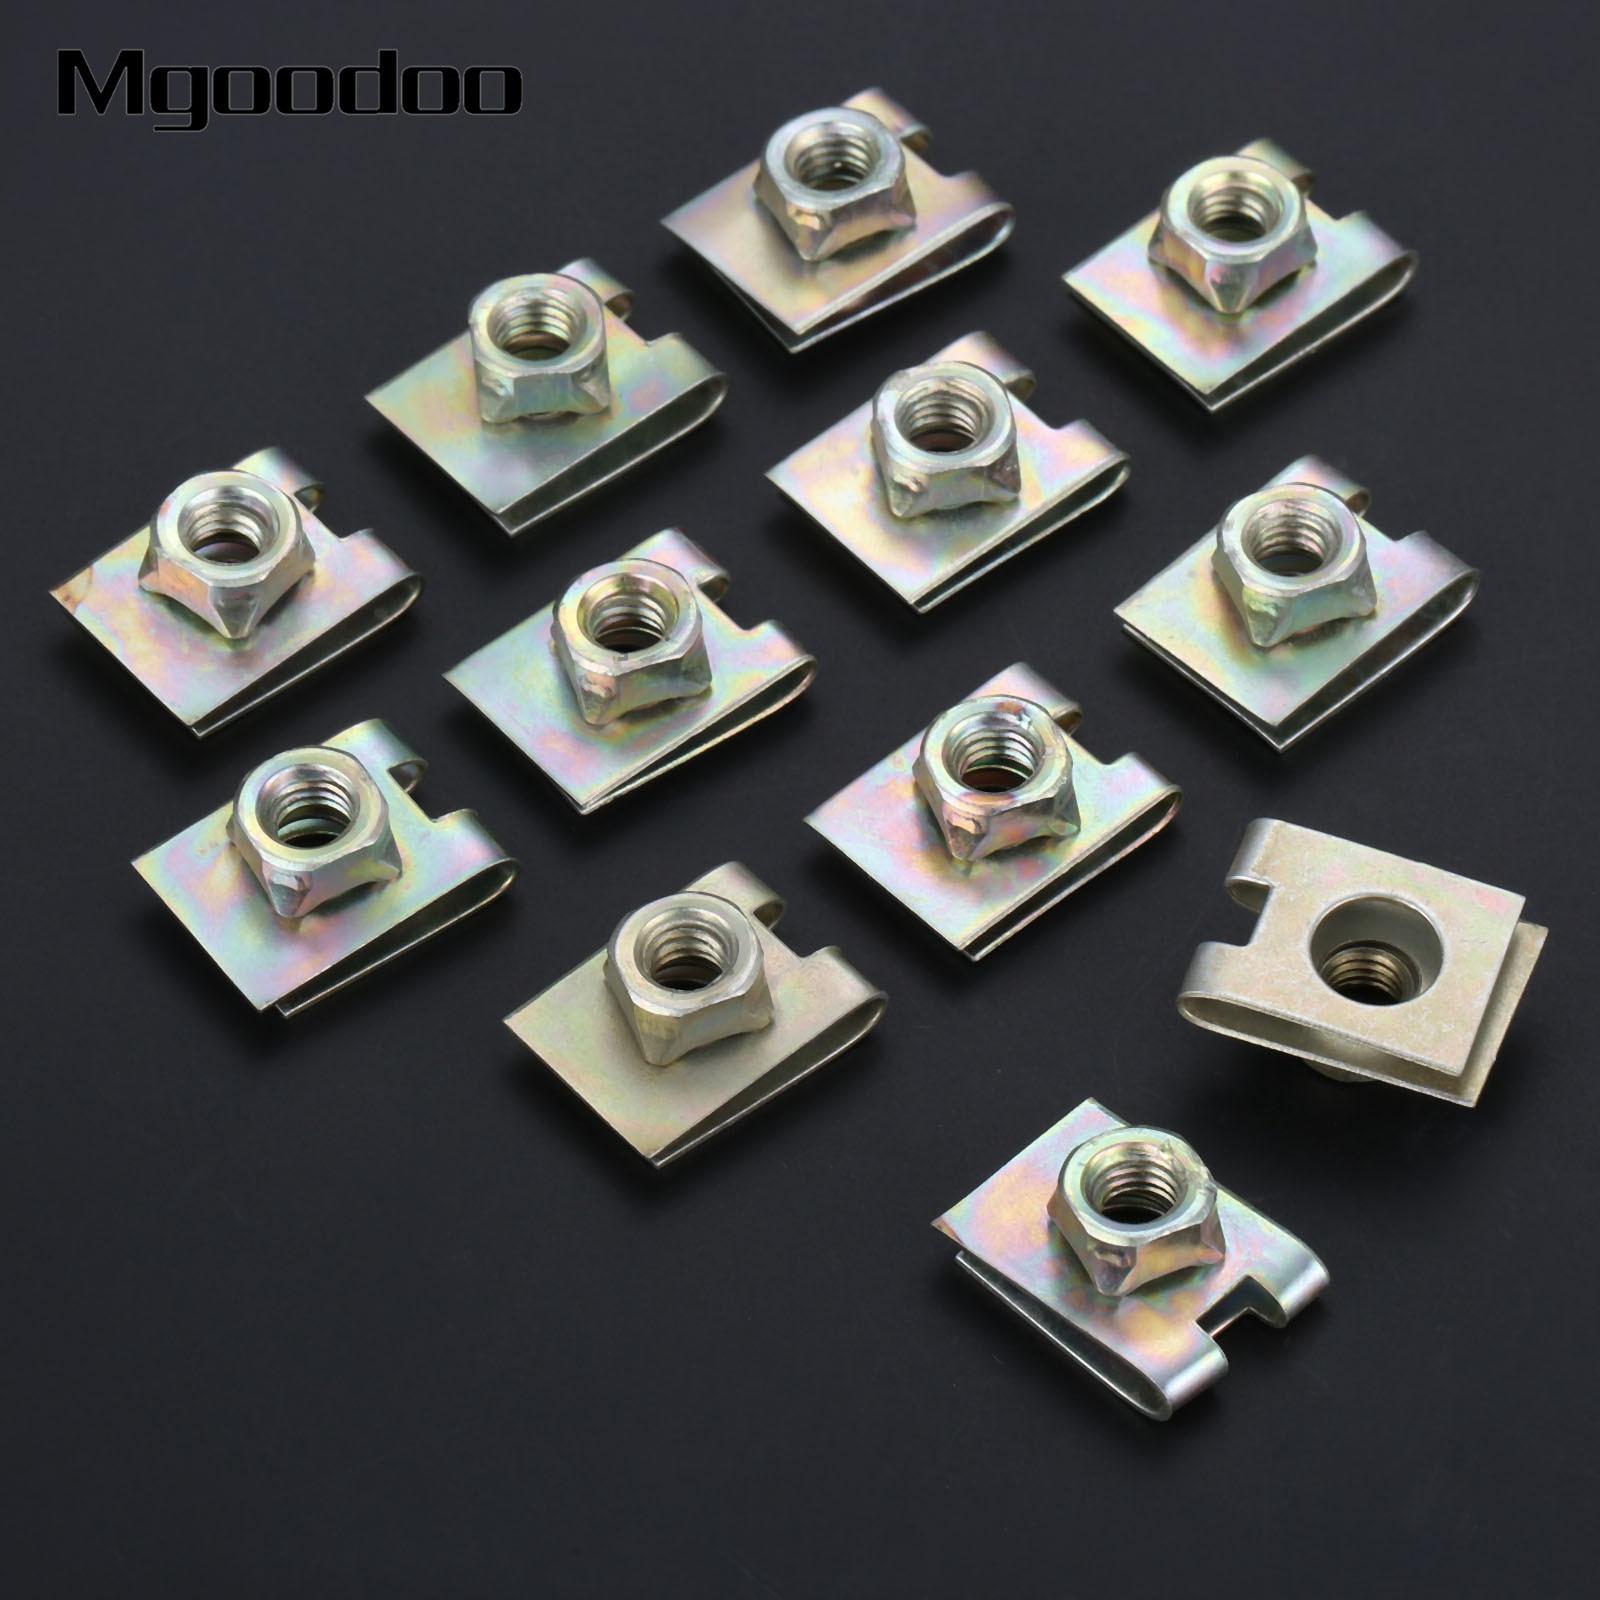 30pcs 6mm M6 Spring Metal U-Type Clip Speed Nut for Car Panel Fender Defense